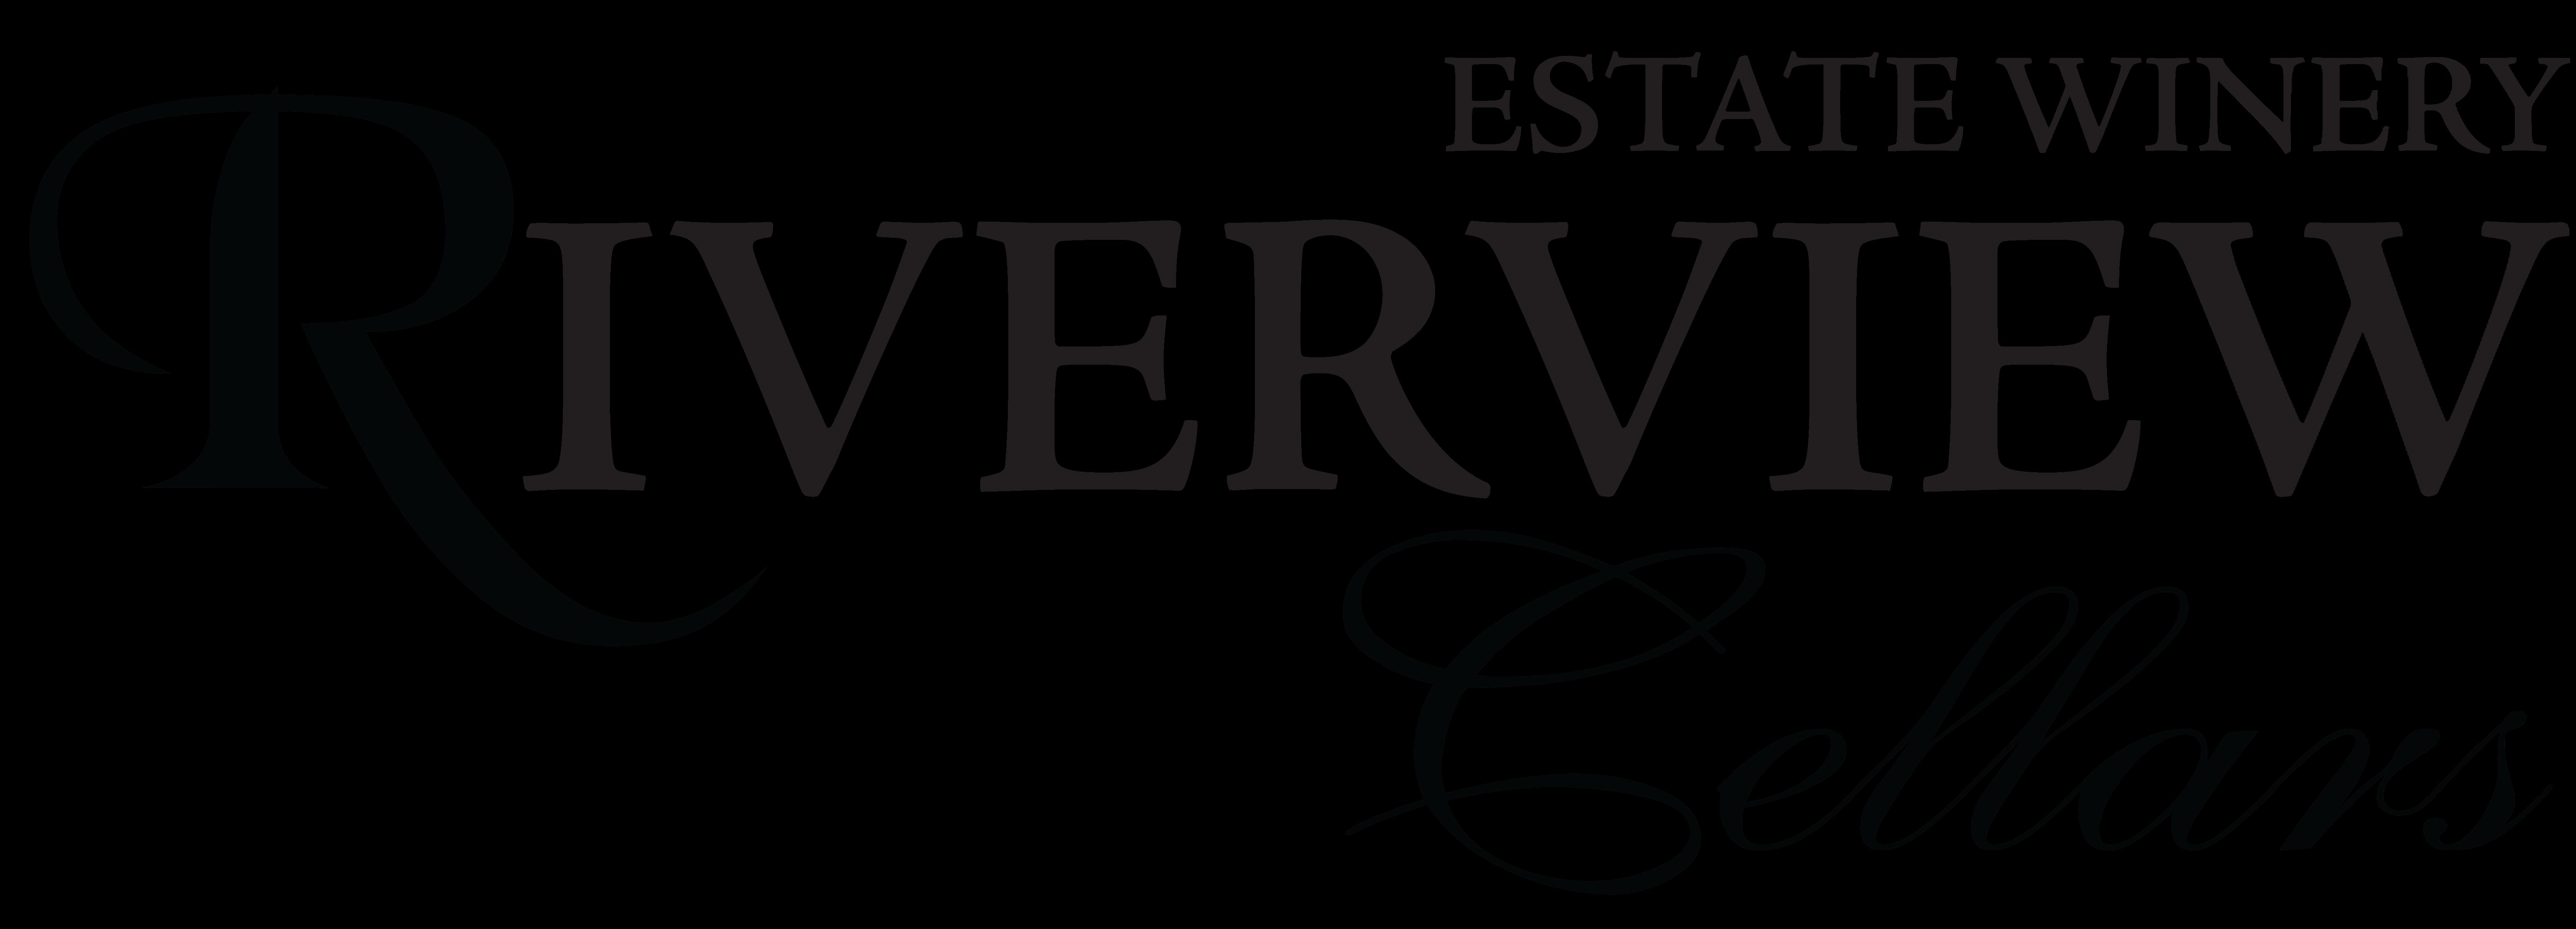 Riverview Cellars Estate Winery logo